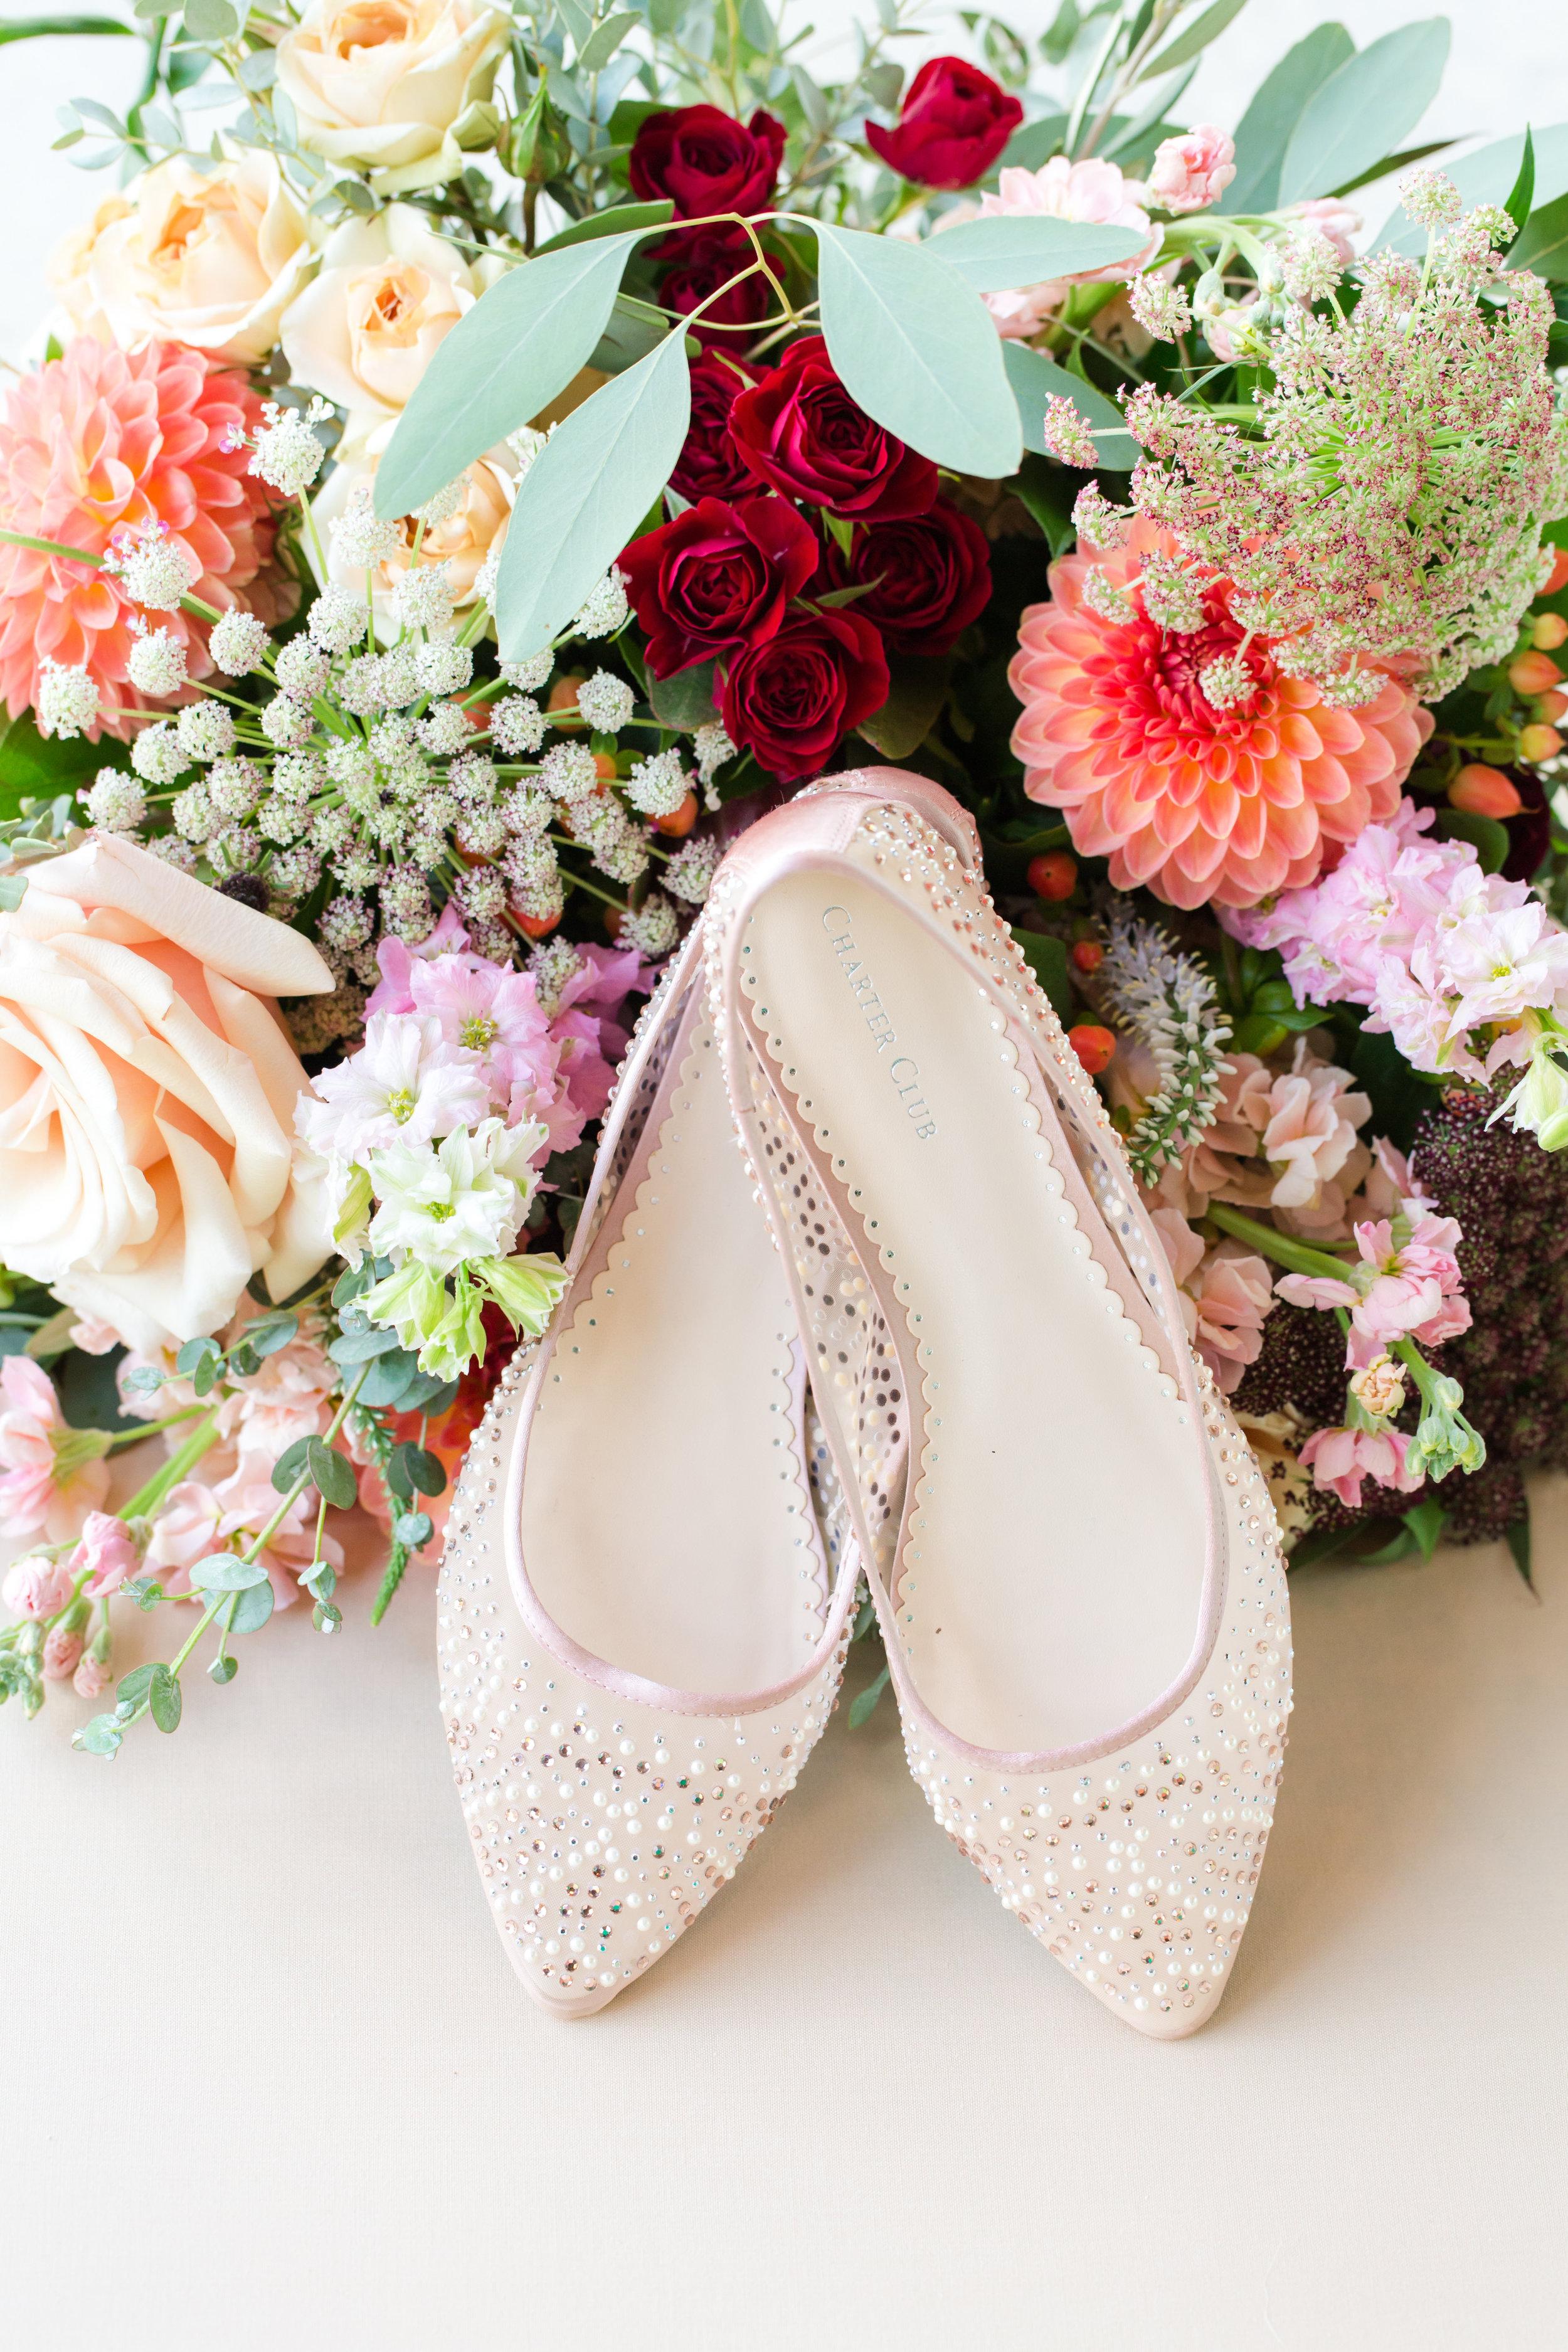 K_S Bridal Details 033.jpg